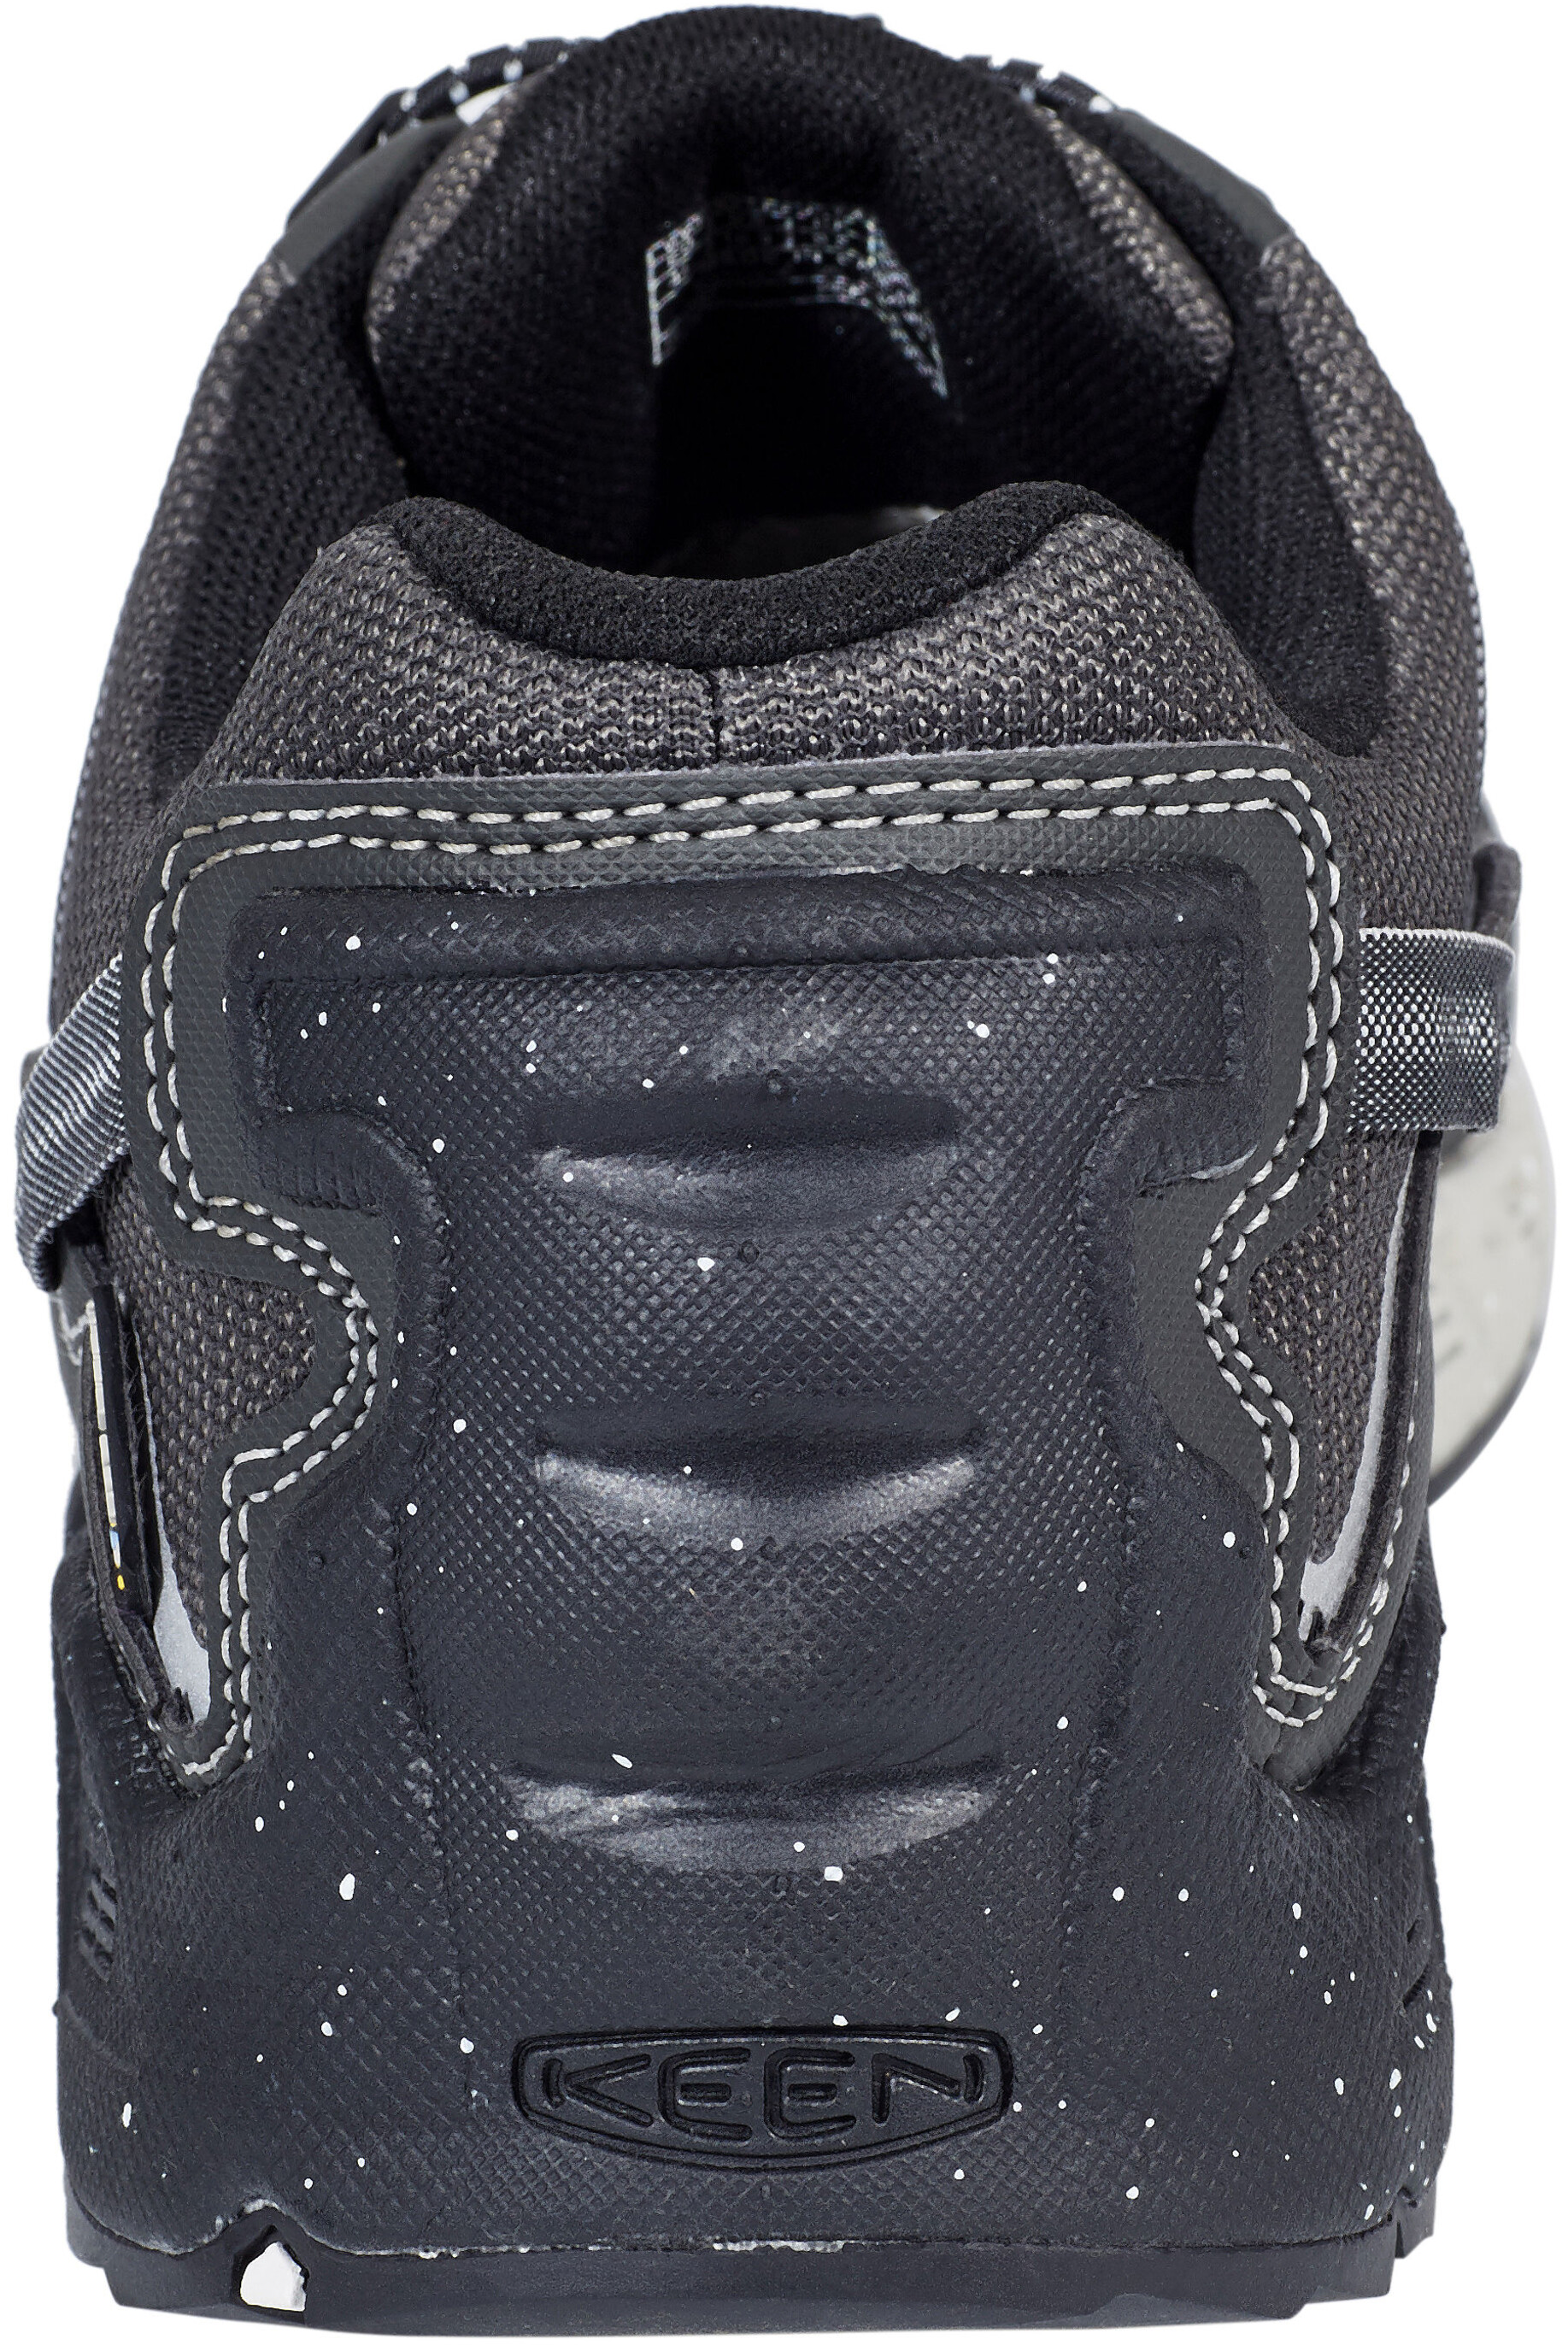 7e6567c9c33 Keen Versatrail WP Shoes Men black at Addnature.co.uk